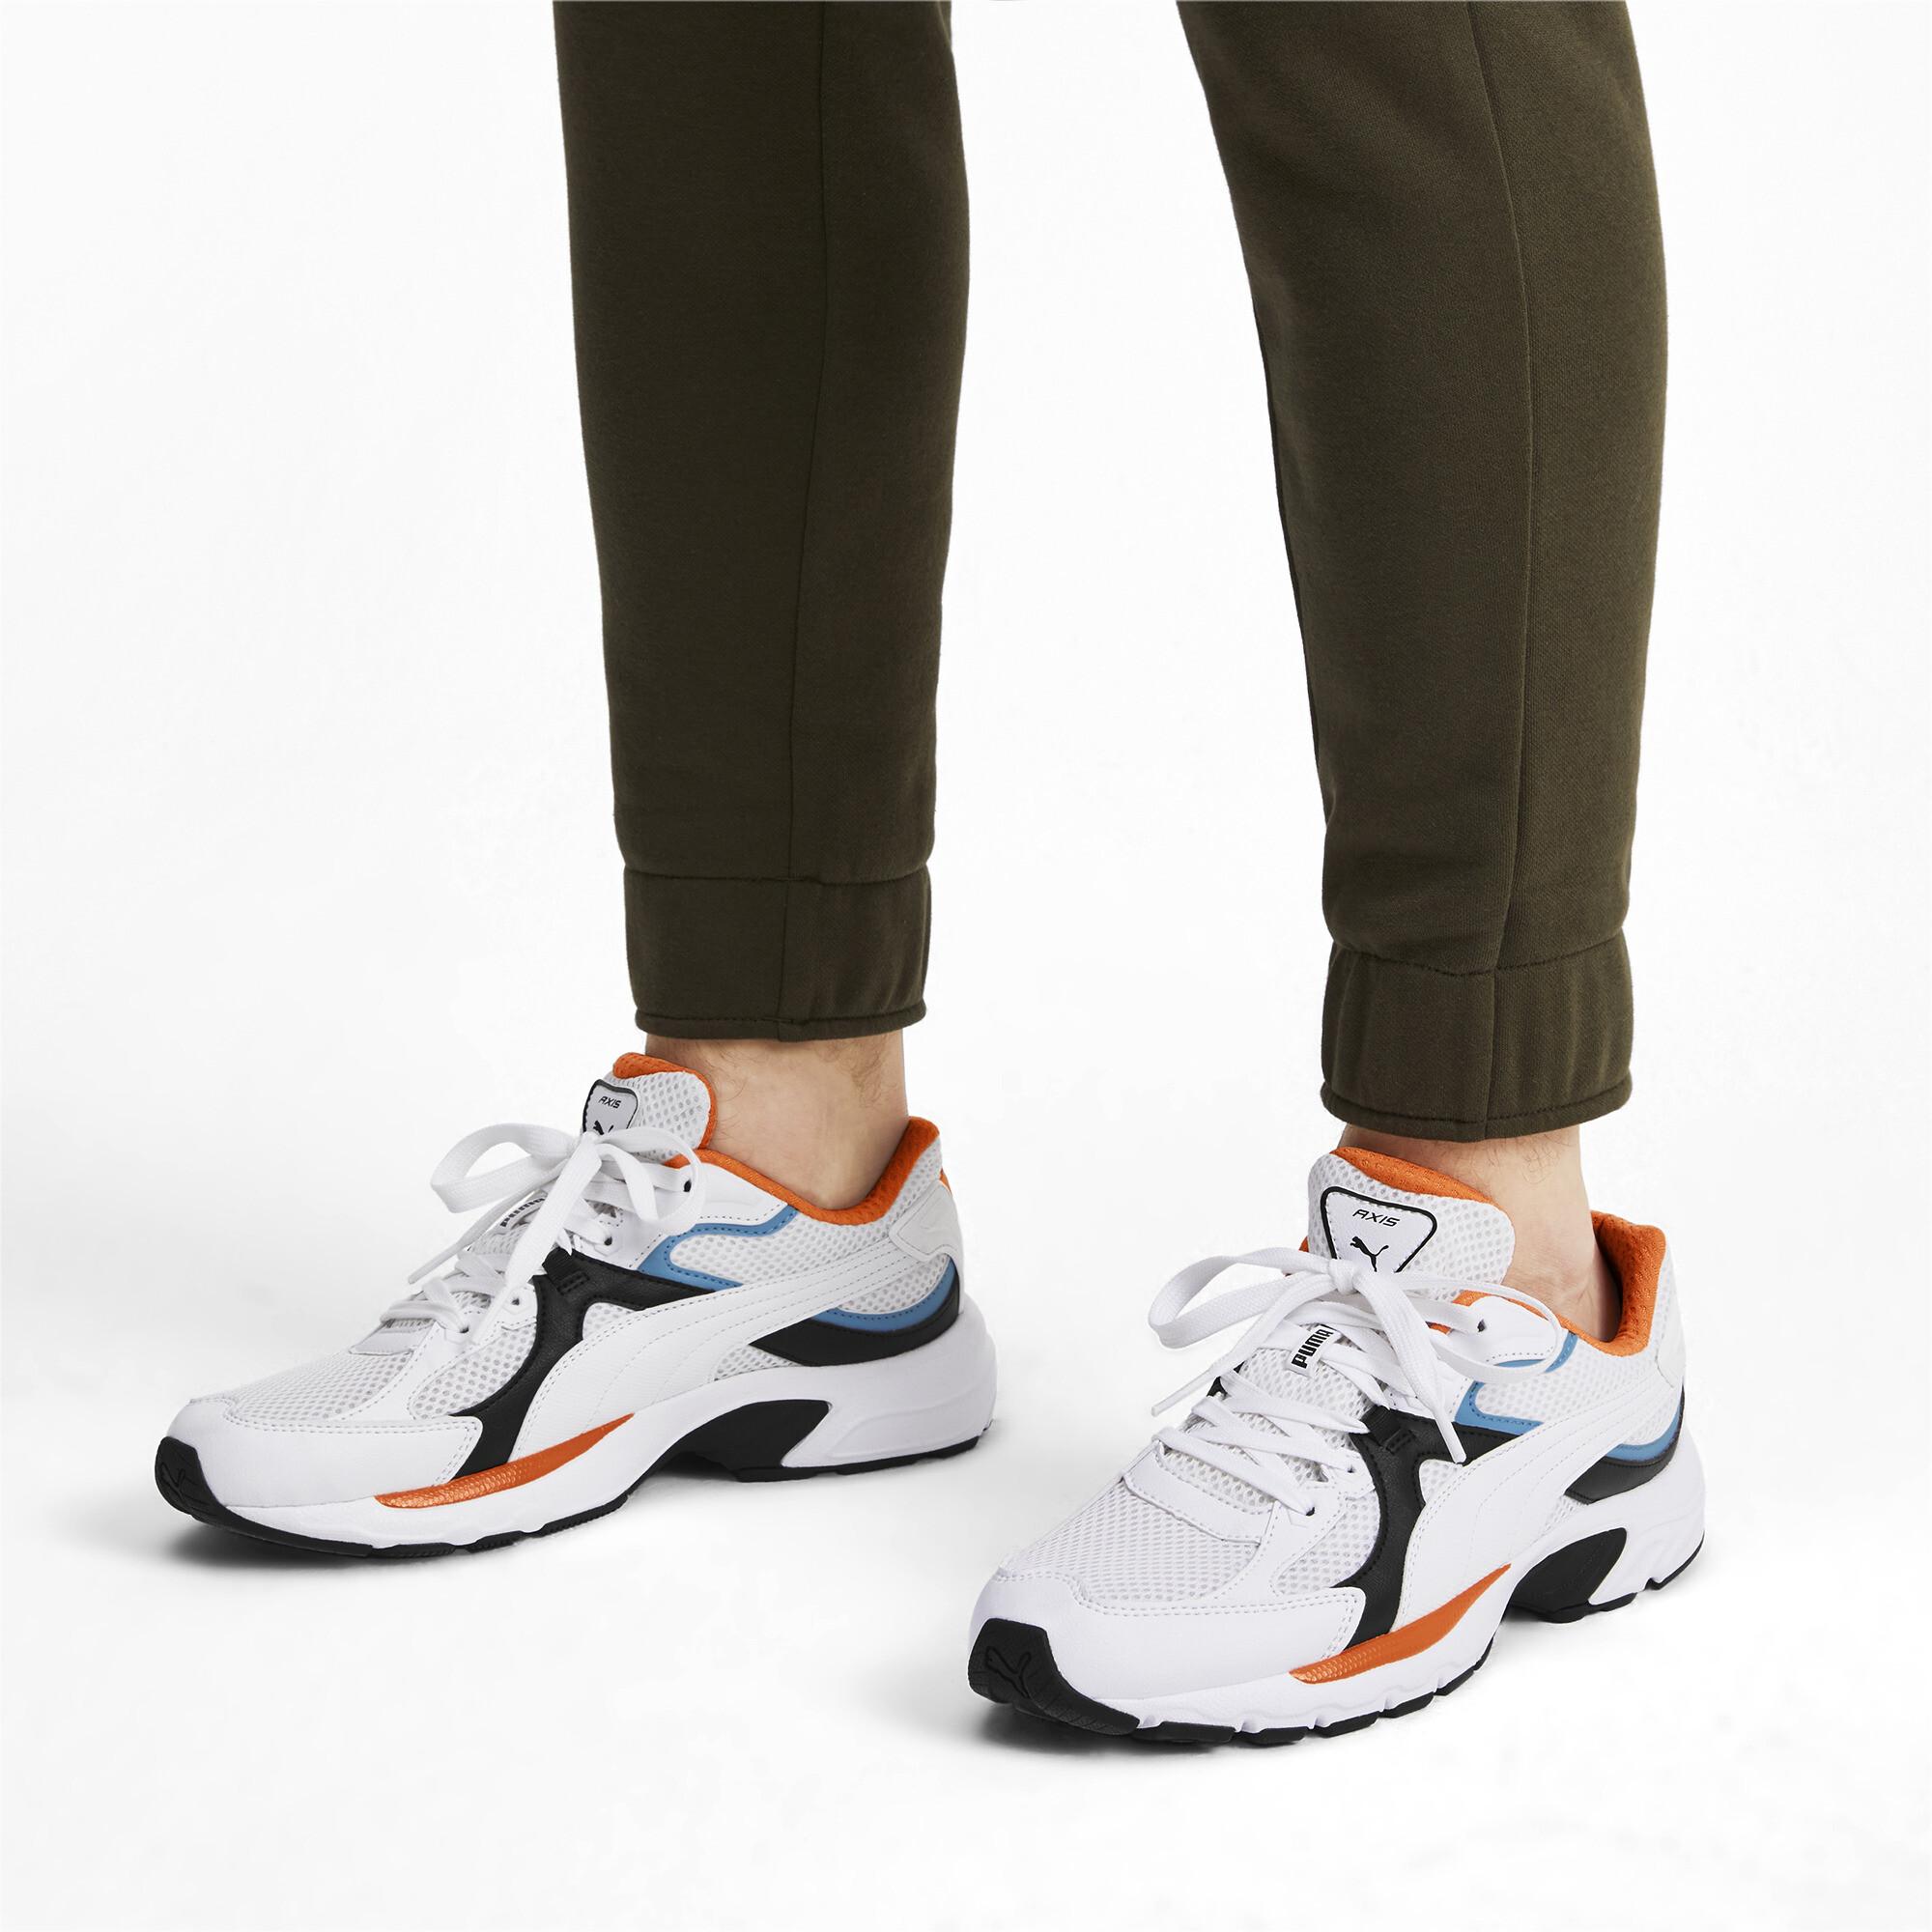 PUMA-Axis-Plus-90s-Sneakers-Men-Shoe-Basics thumbnail 18